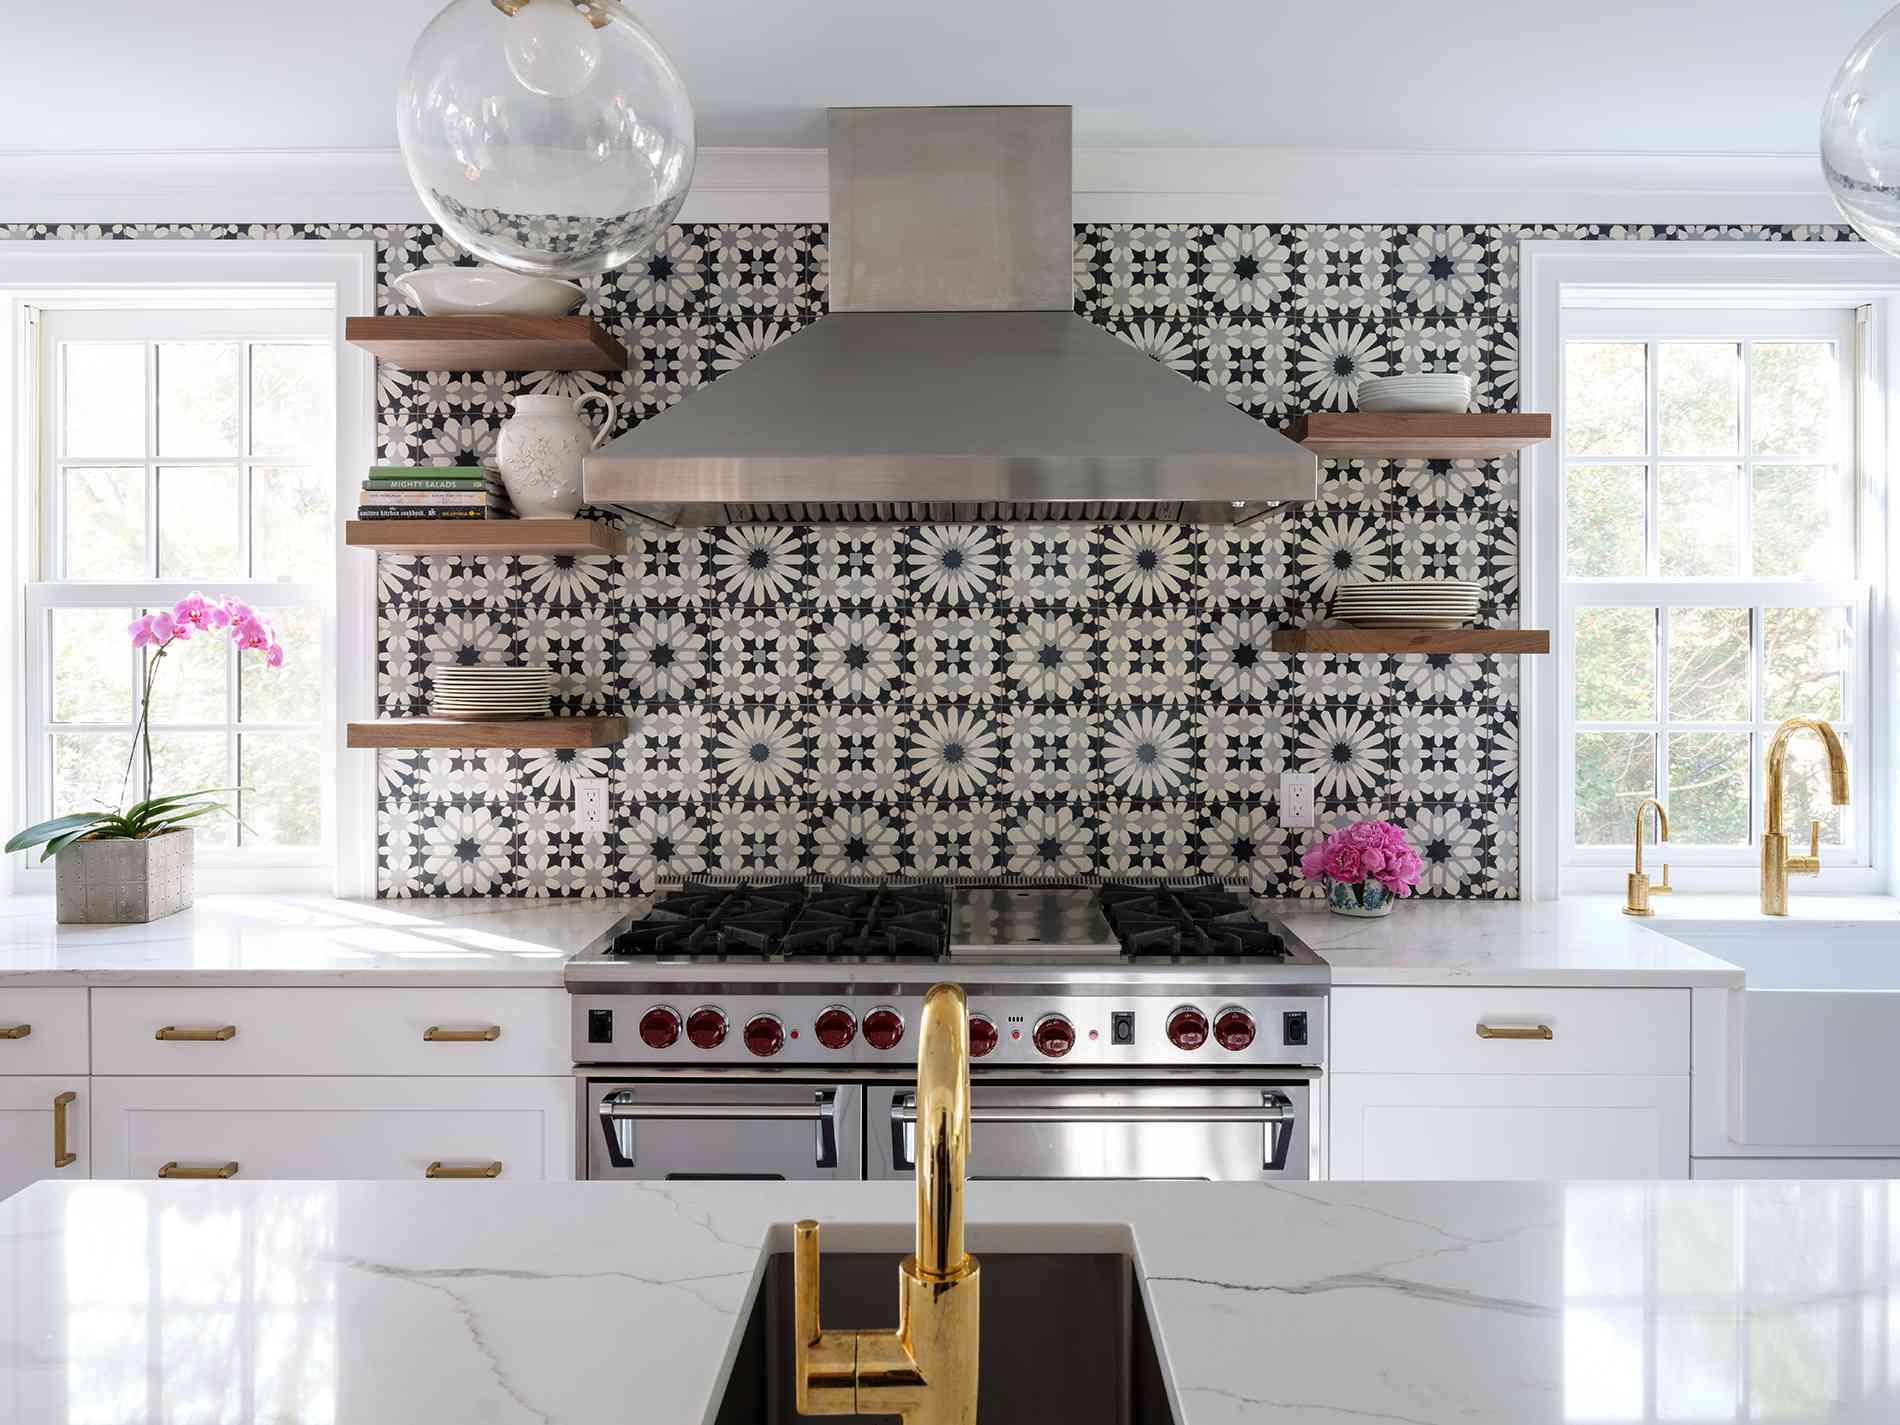 Kitchen with black and white backsplash.